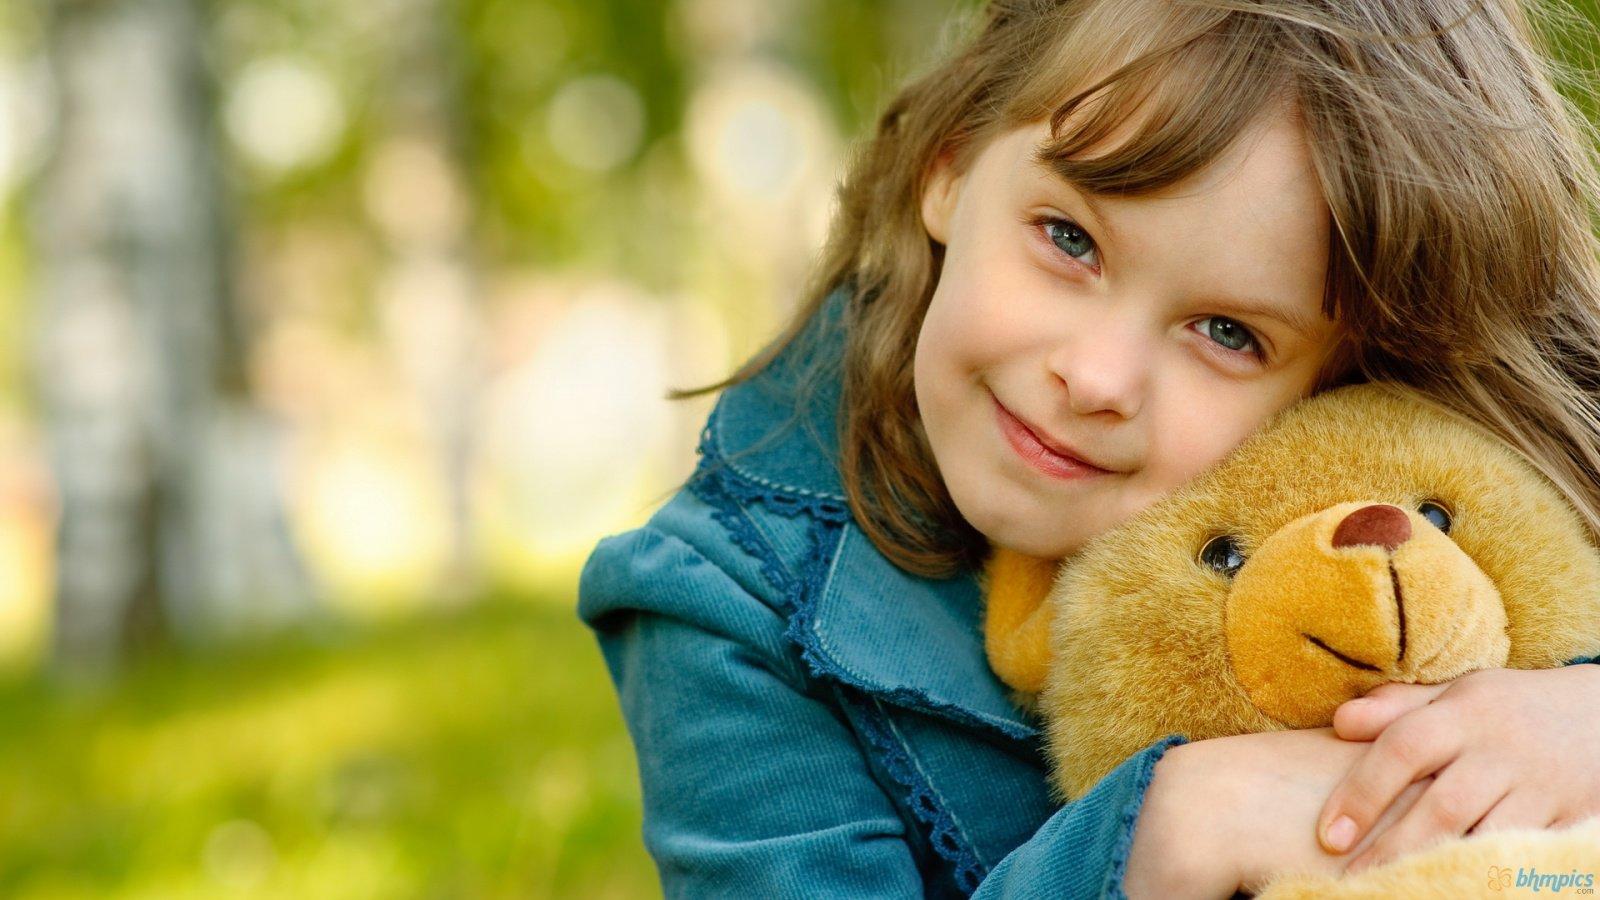 nice baby girl with her teddy bear hd wallpaper | cute little babies